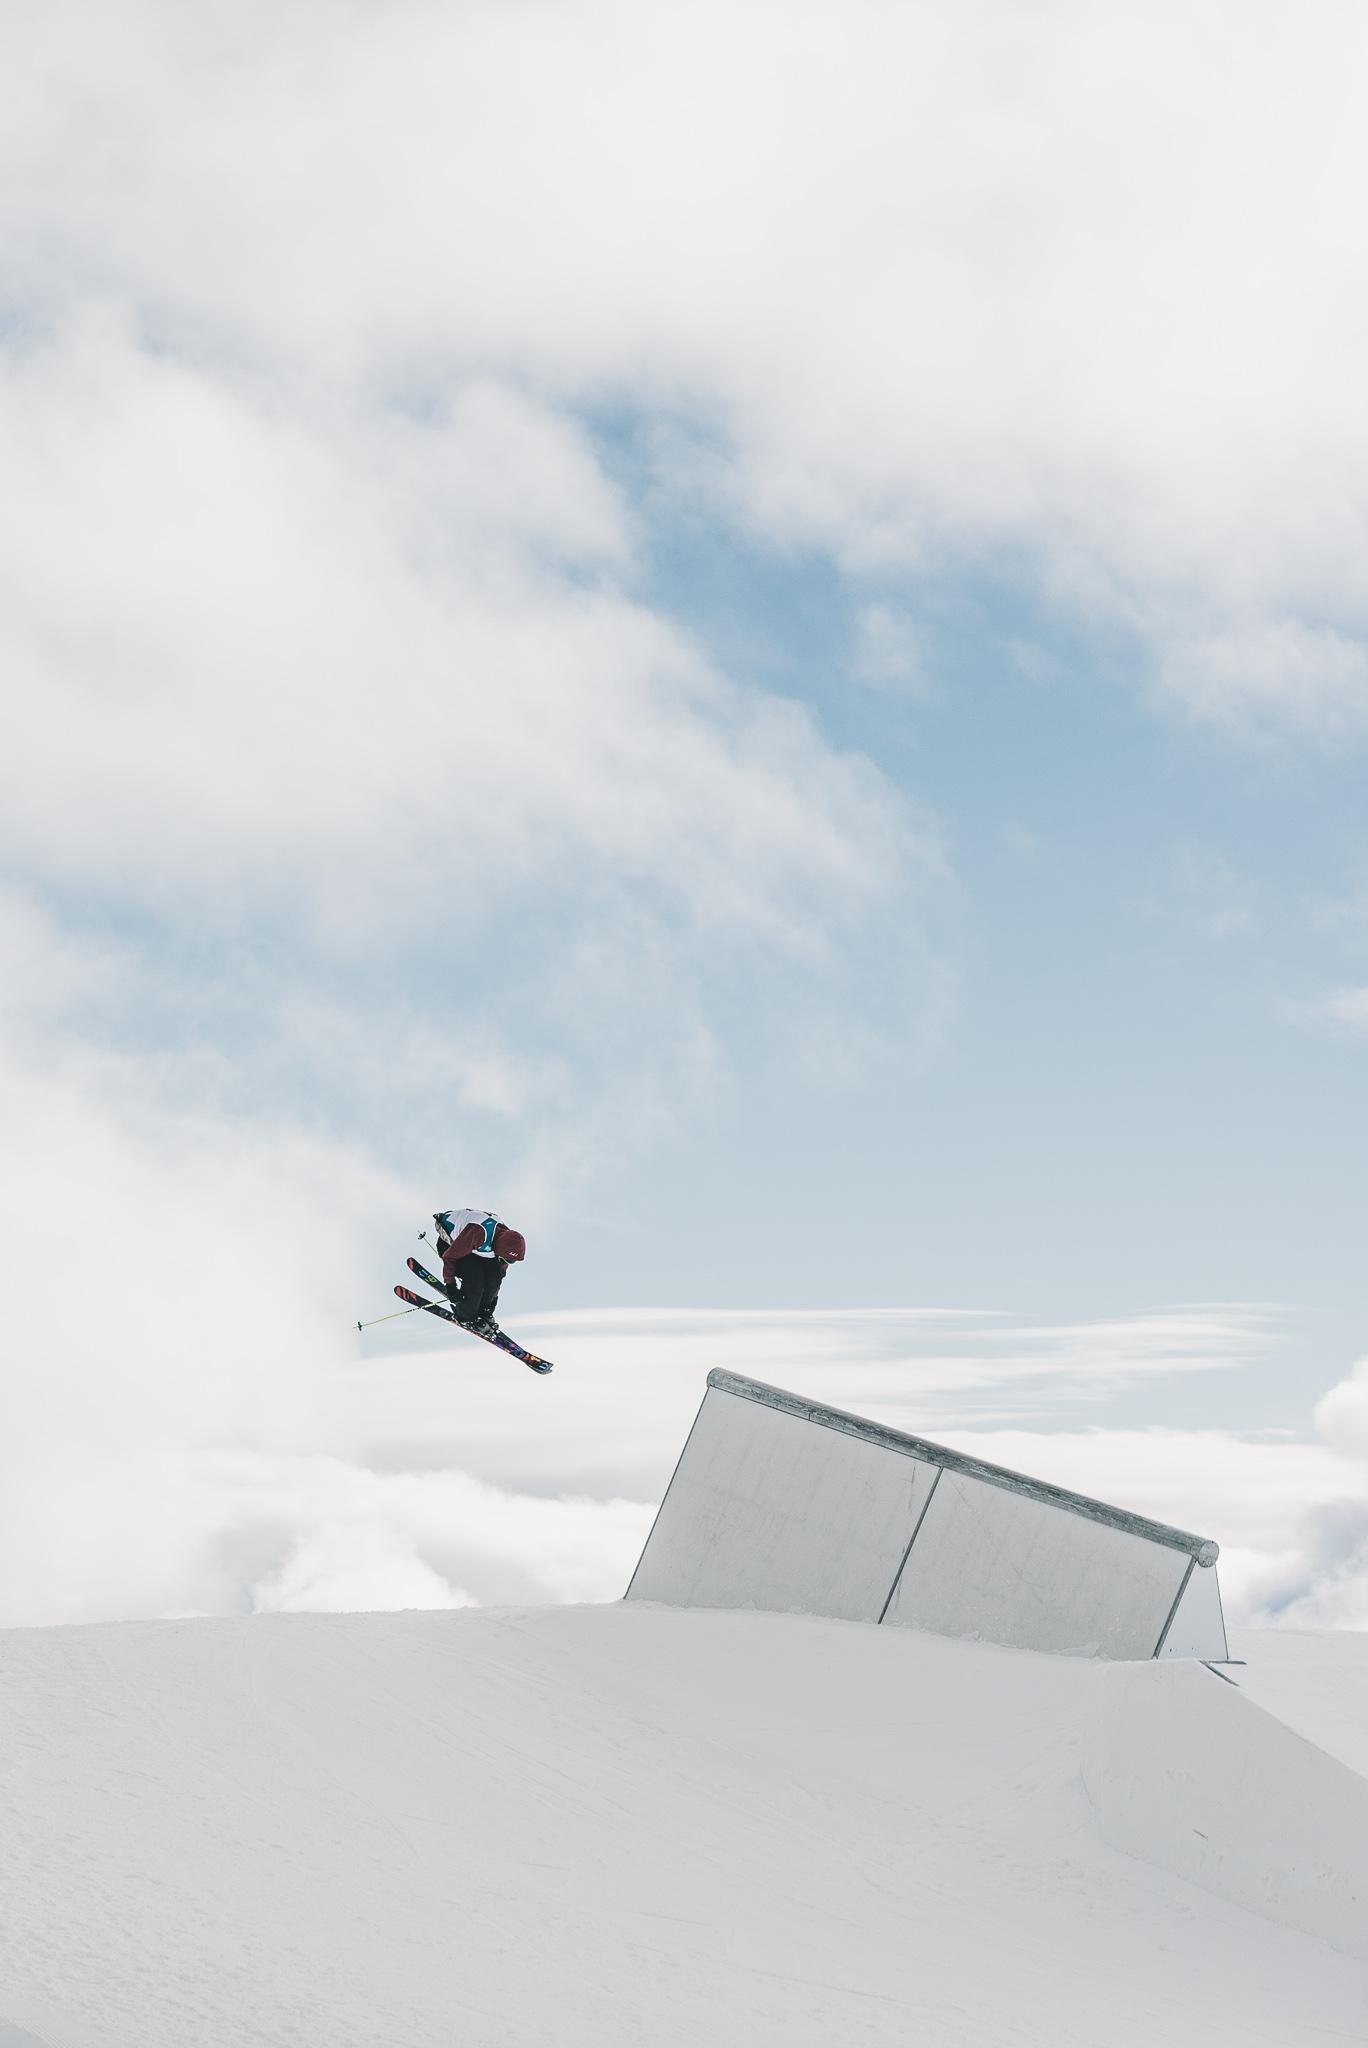 Rider: Simon Bartik